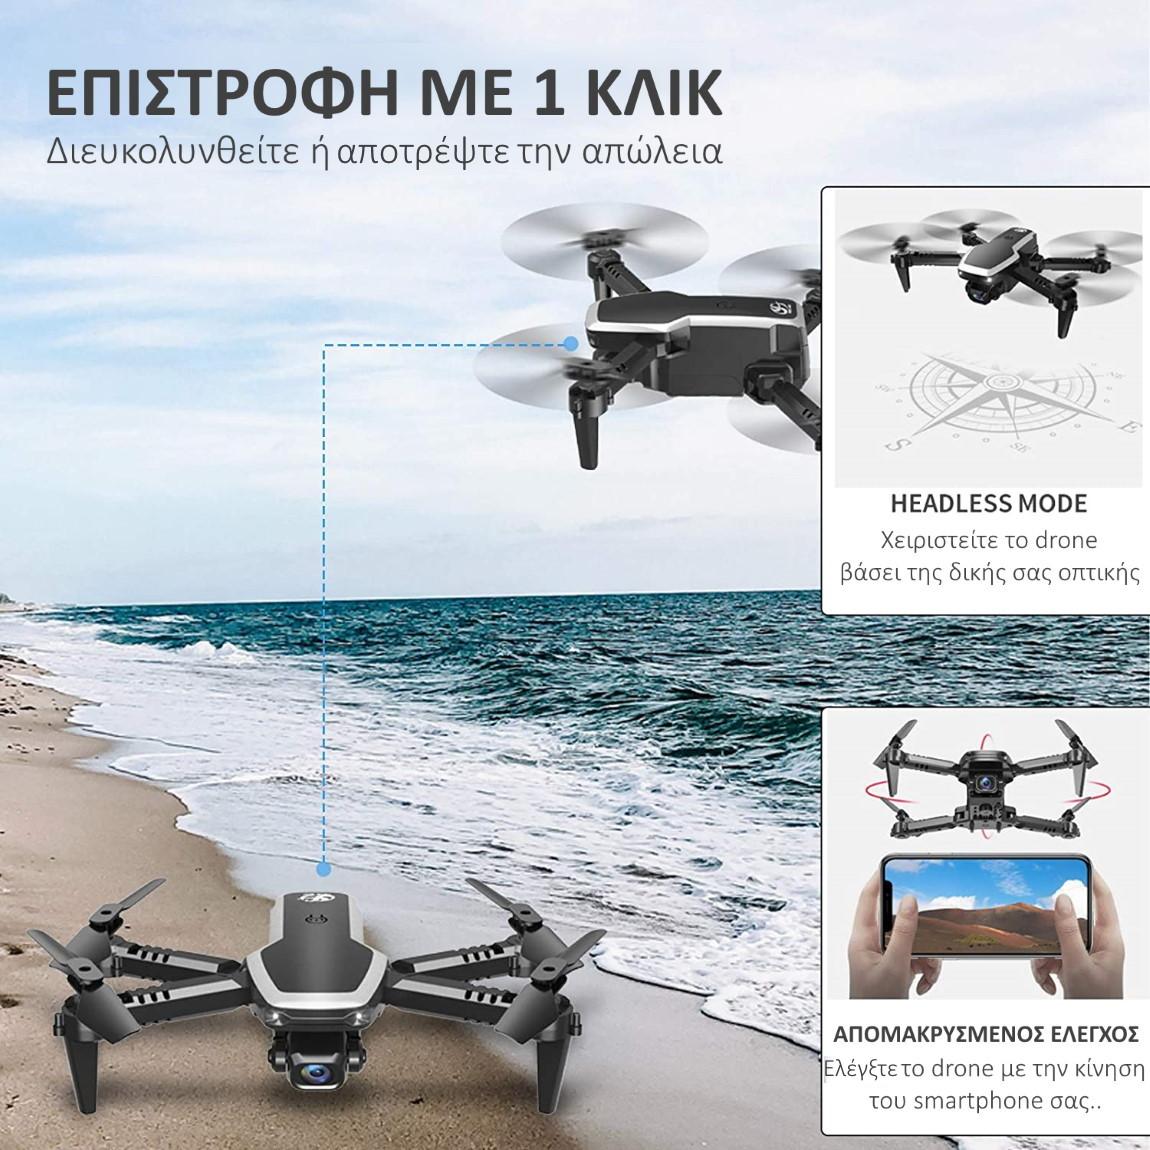 ToySky S171 Αναδιπλούμενο Mini Drone Quadcopter απομακρυσμένος έλεγχος